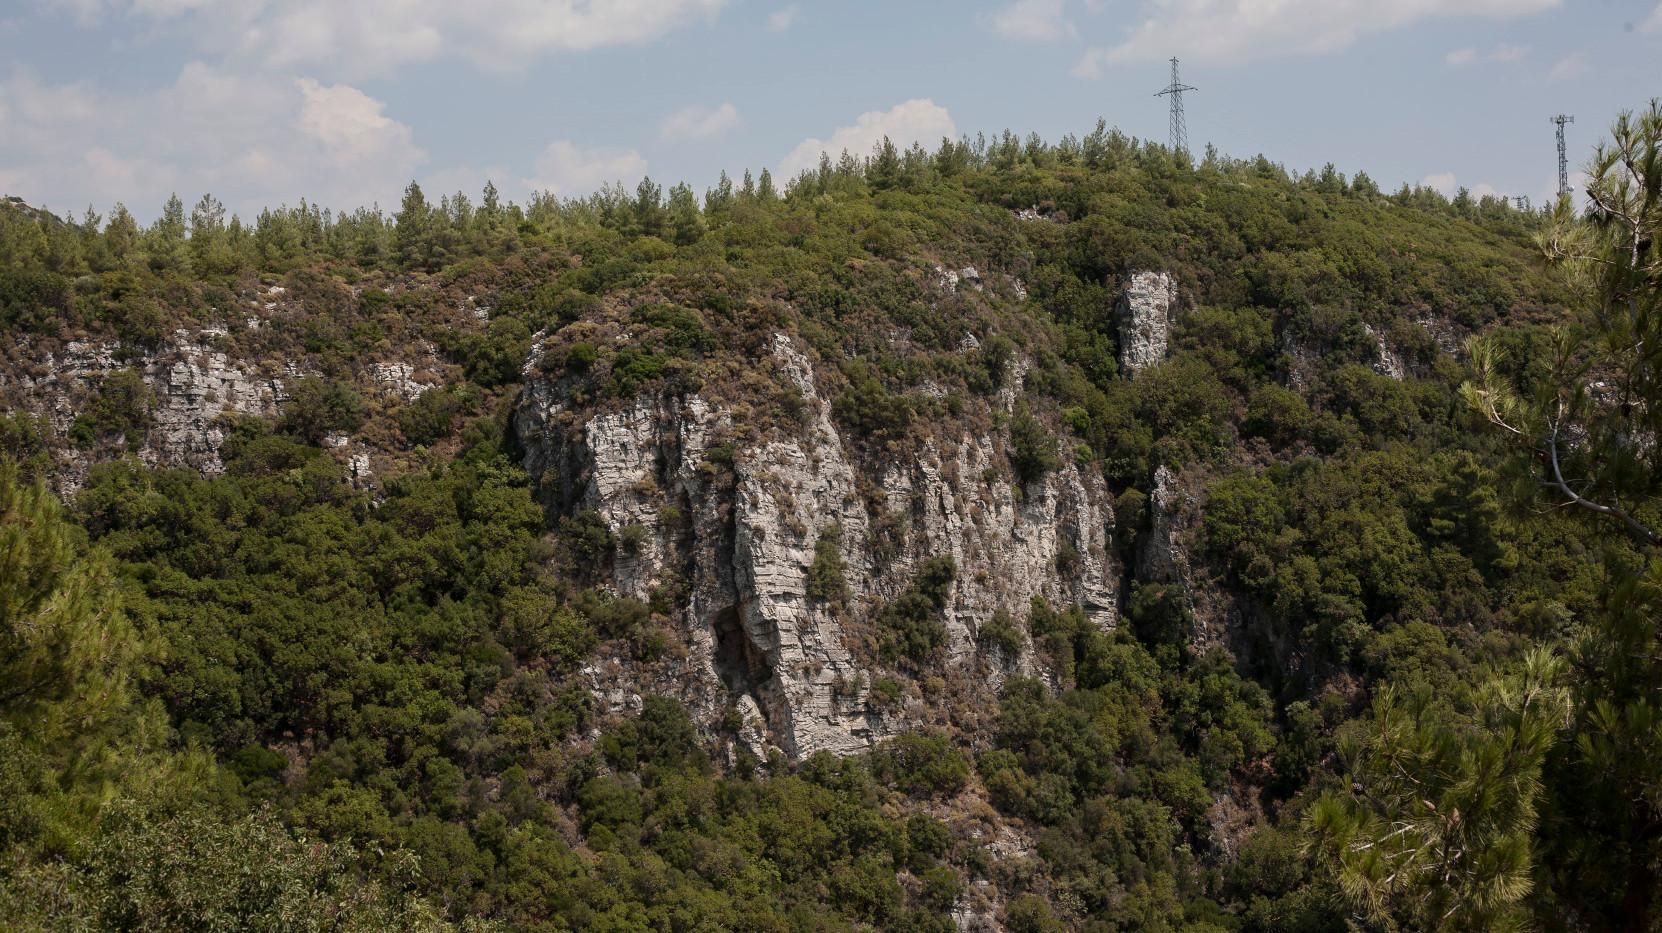 Triangular forest - Before